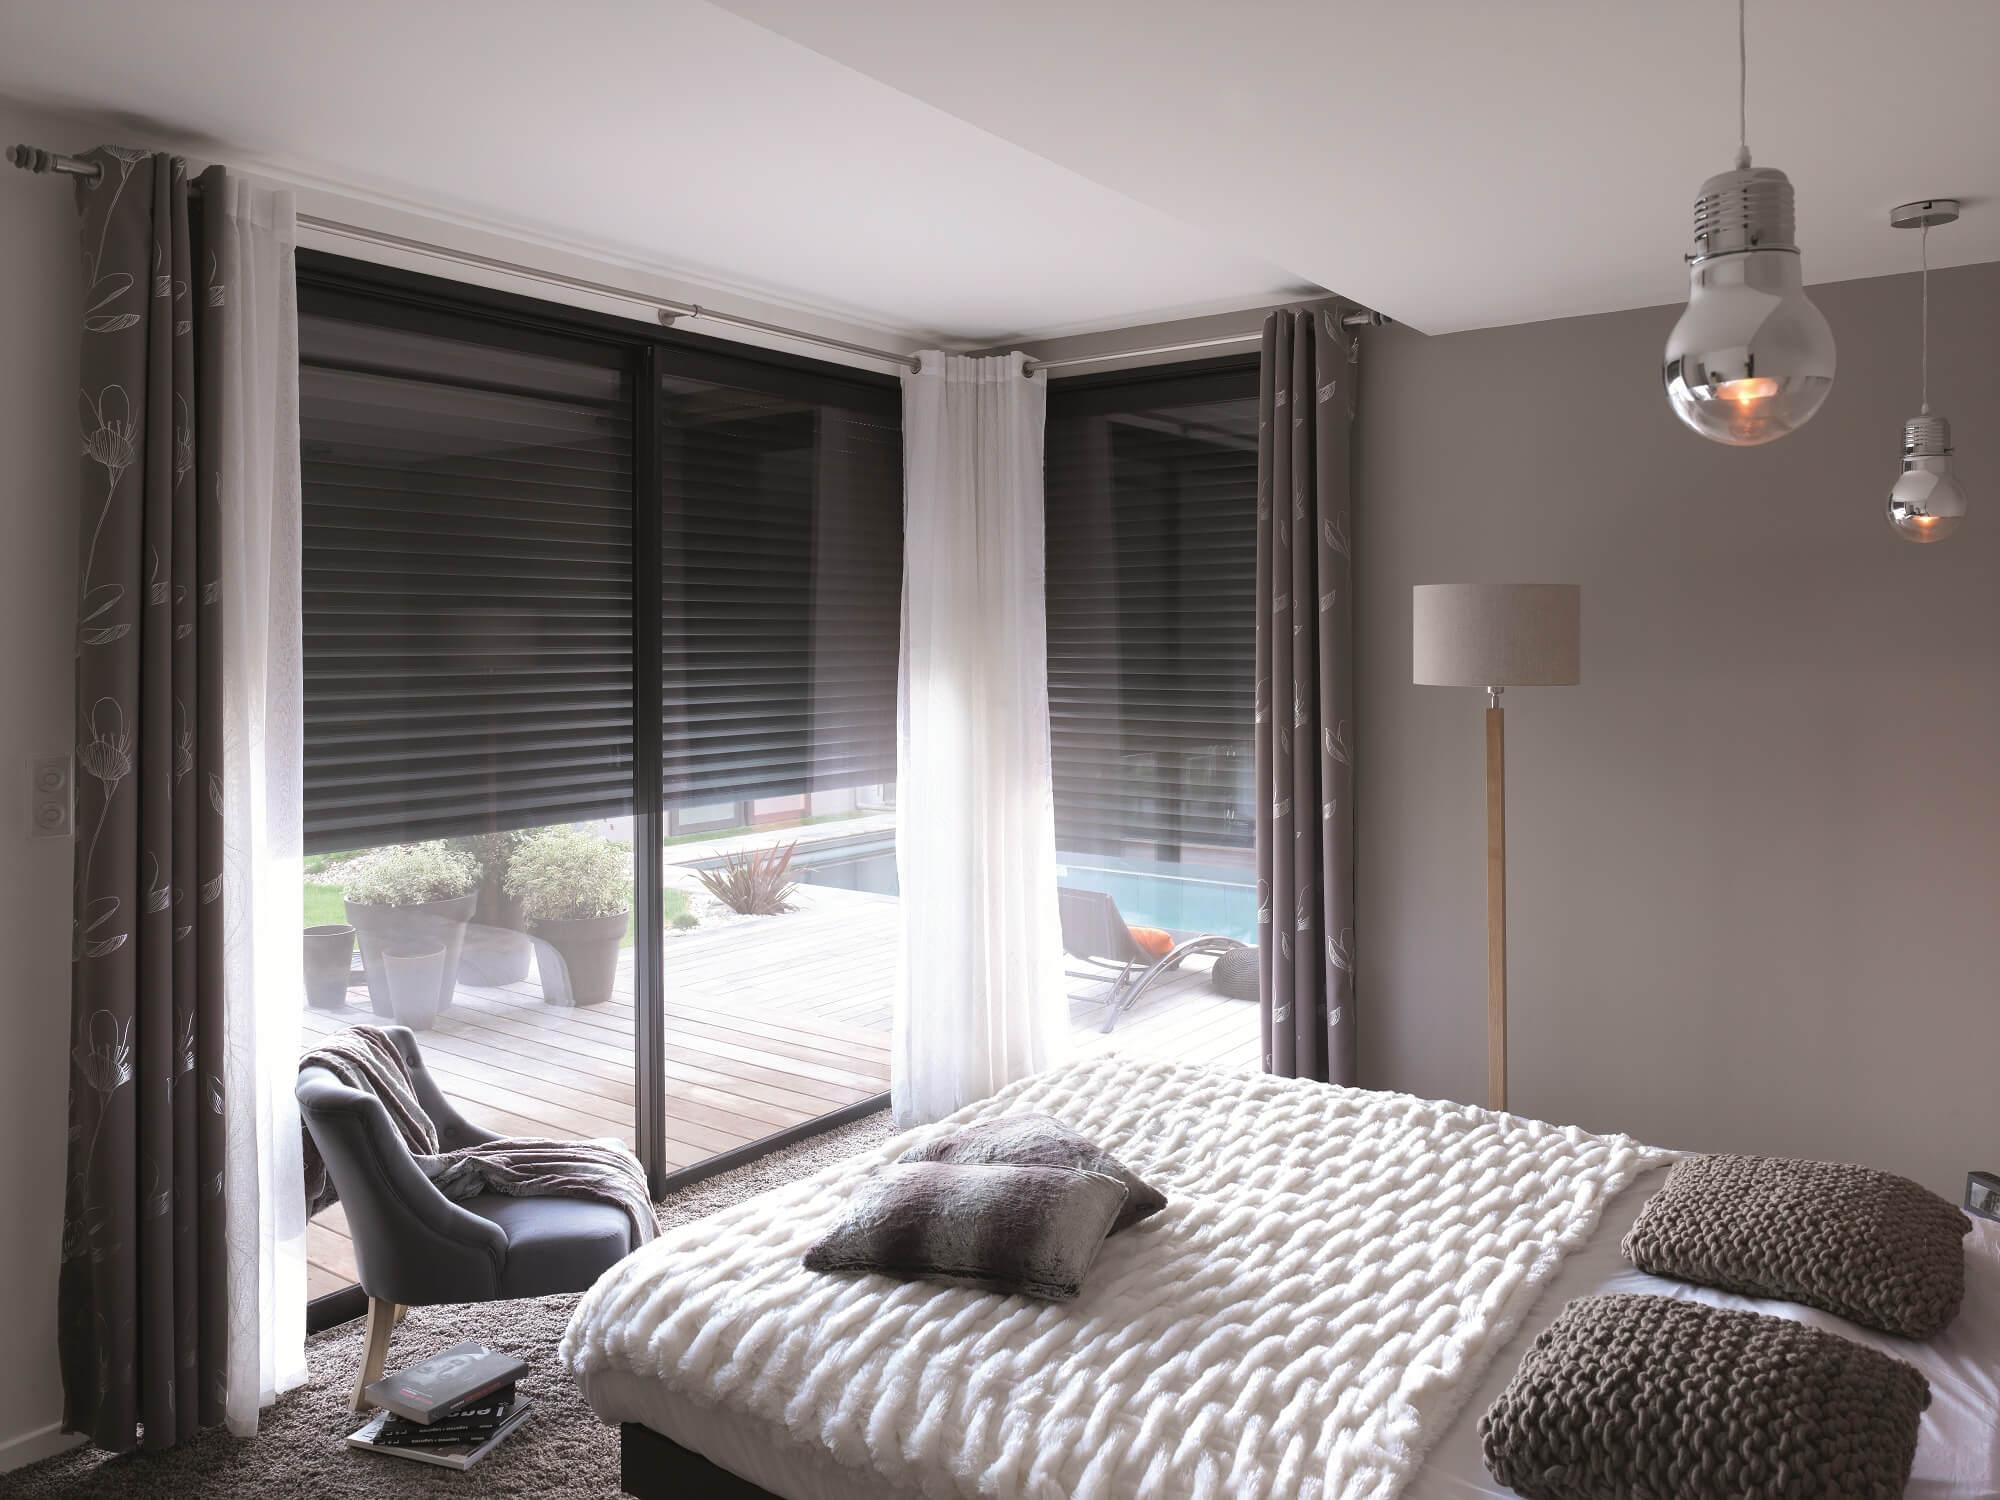 volet roulant int gr volets roulants motoris s alu pvc solabaie. Black Bedroom Furniture Sets. Home Design Ideas